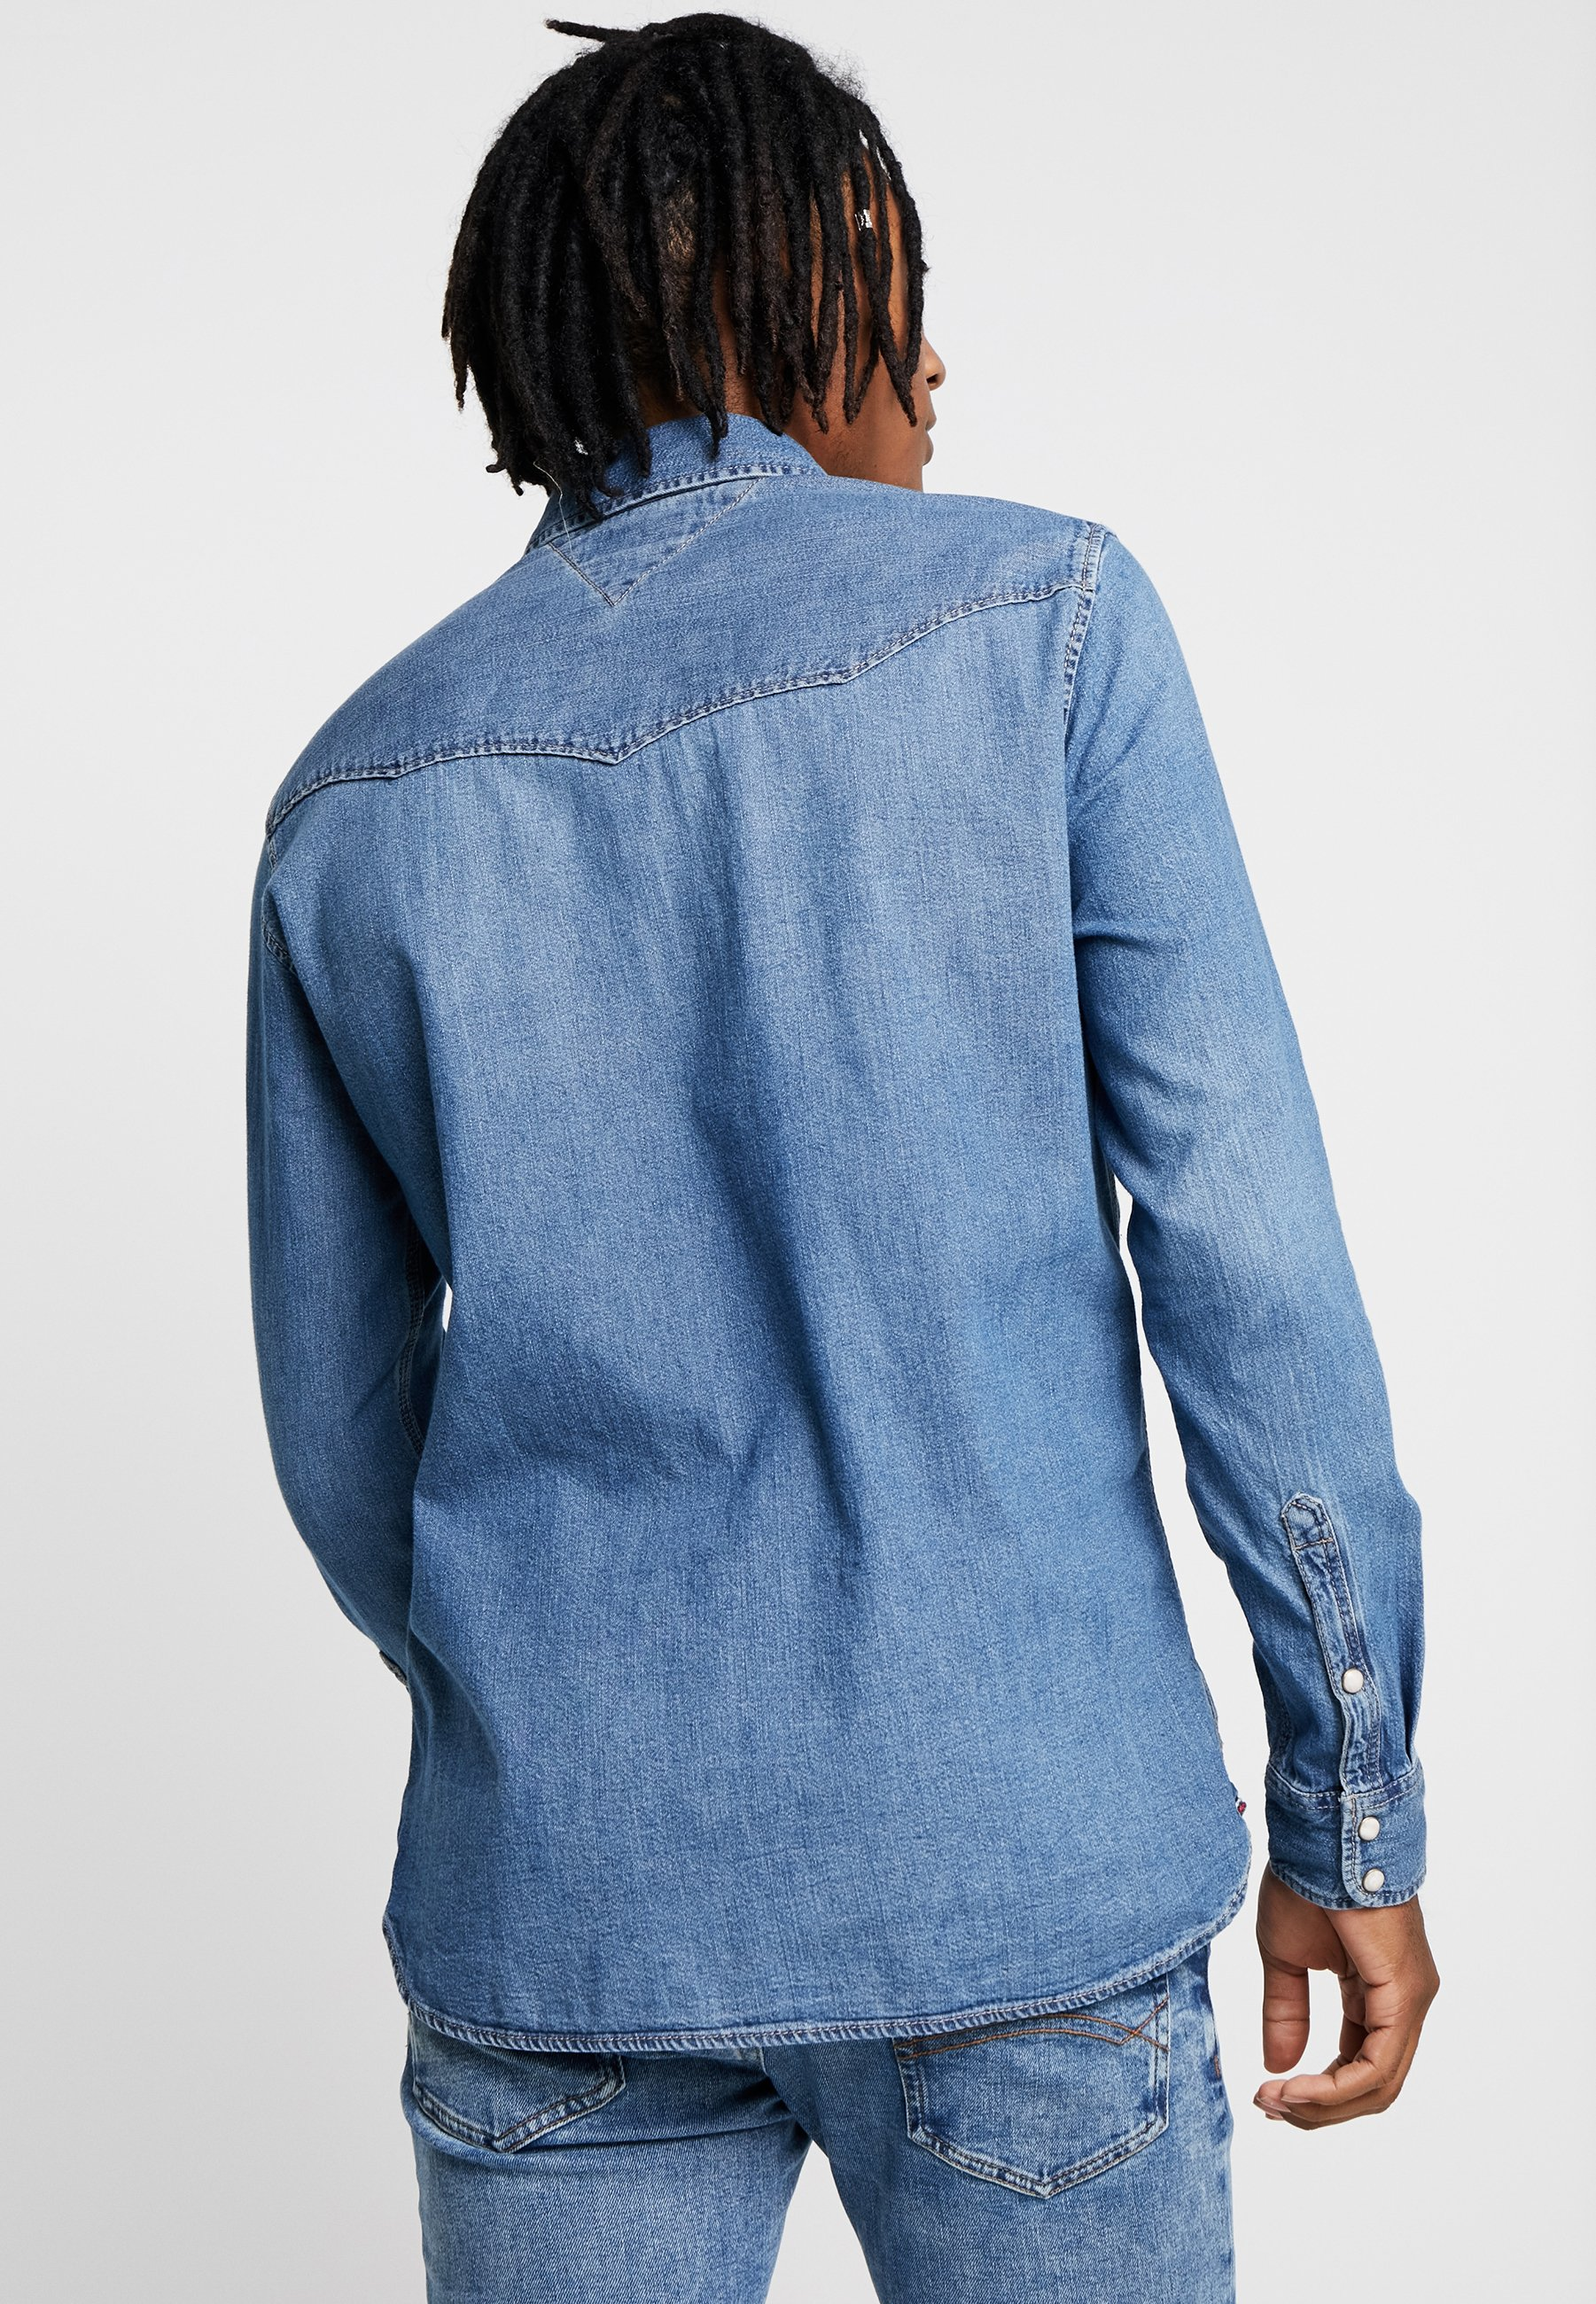 Jeans ShirtChemise Tommy Western Denim WED2IH9Y